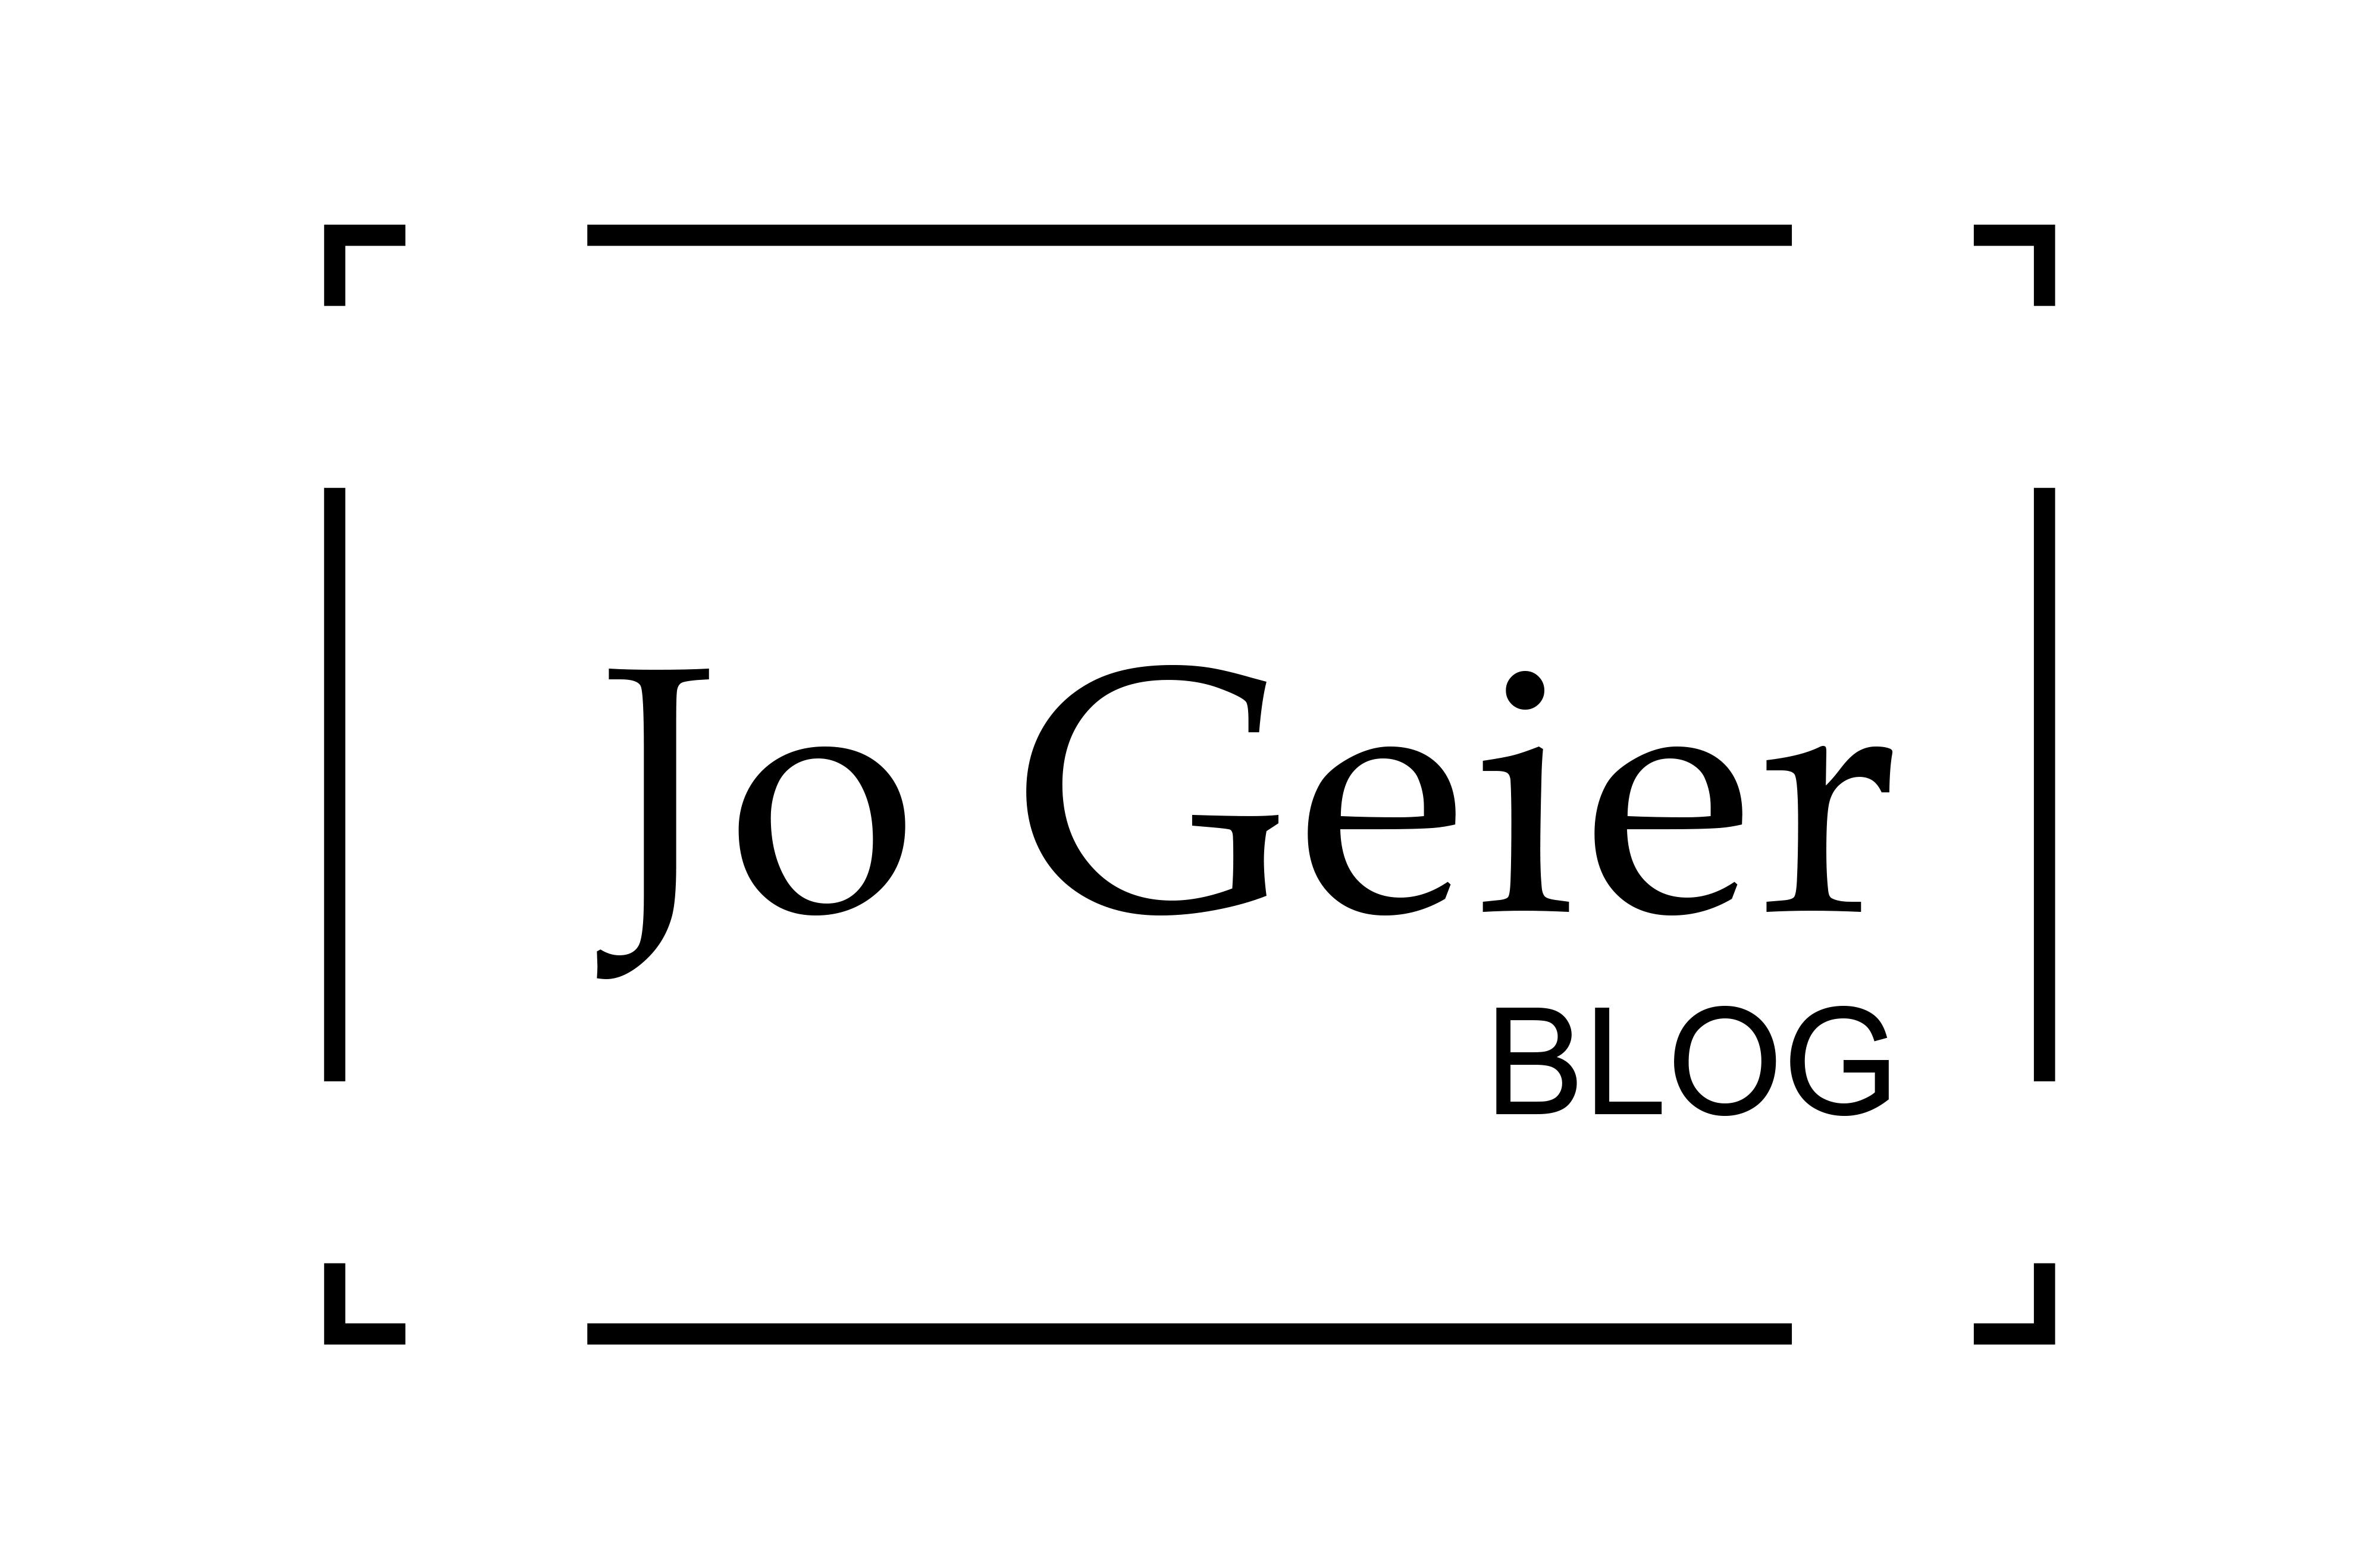 Welcome to the Jo Geier - Mint & Rare BLOG